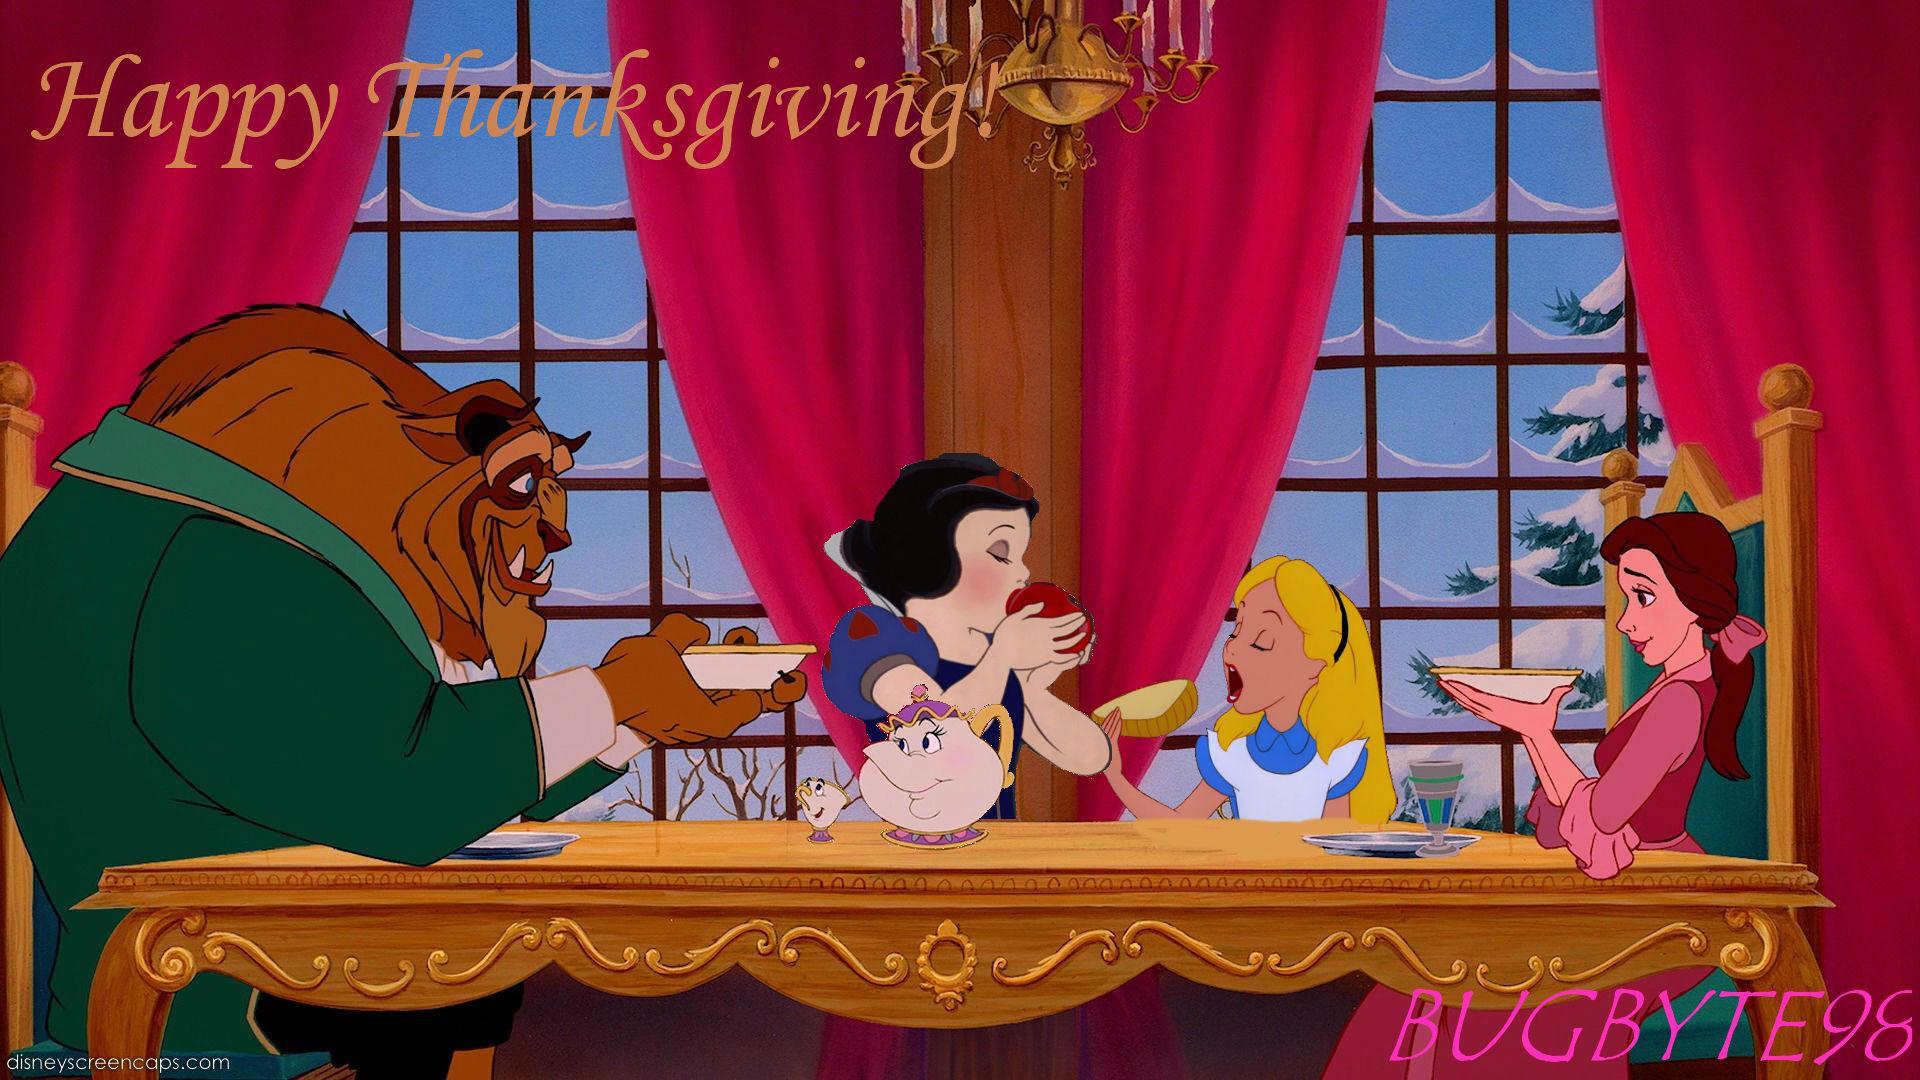 Disney Thanksgiving Wallpaper Wallpapersafari